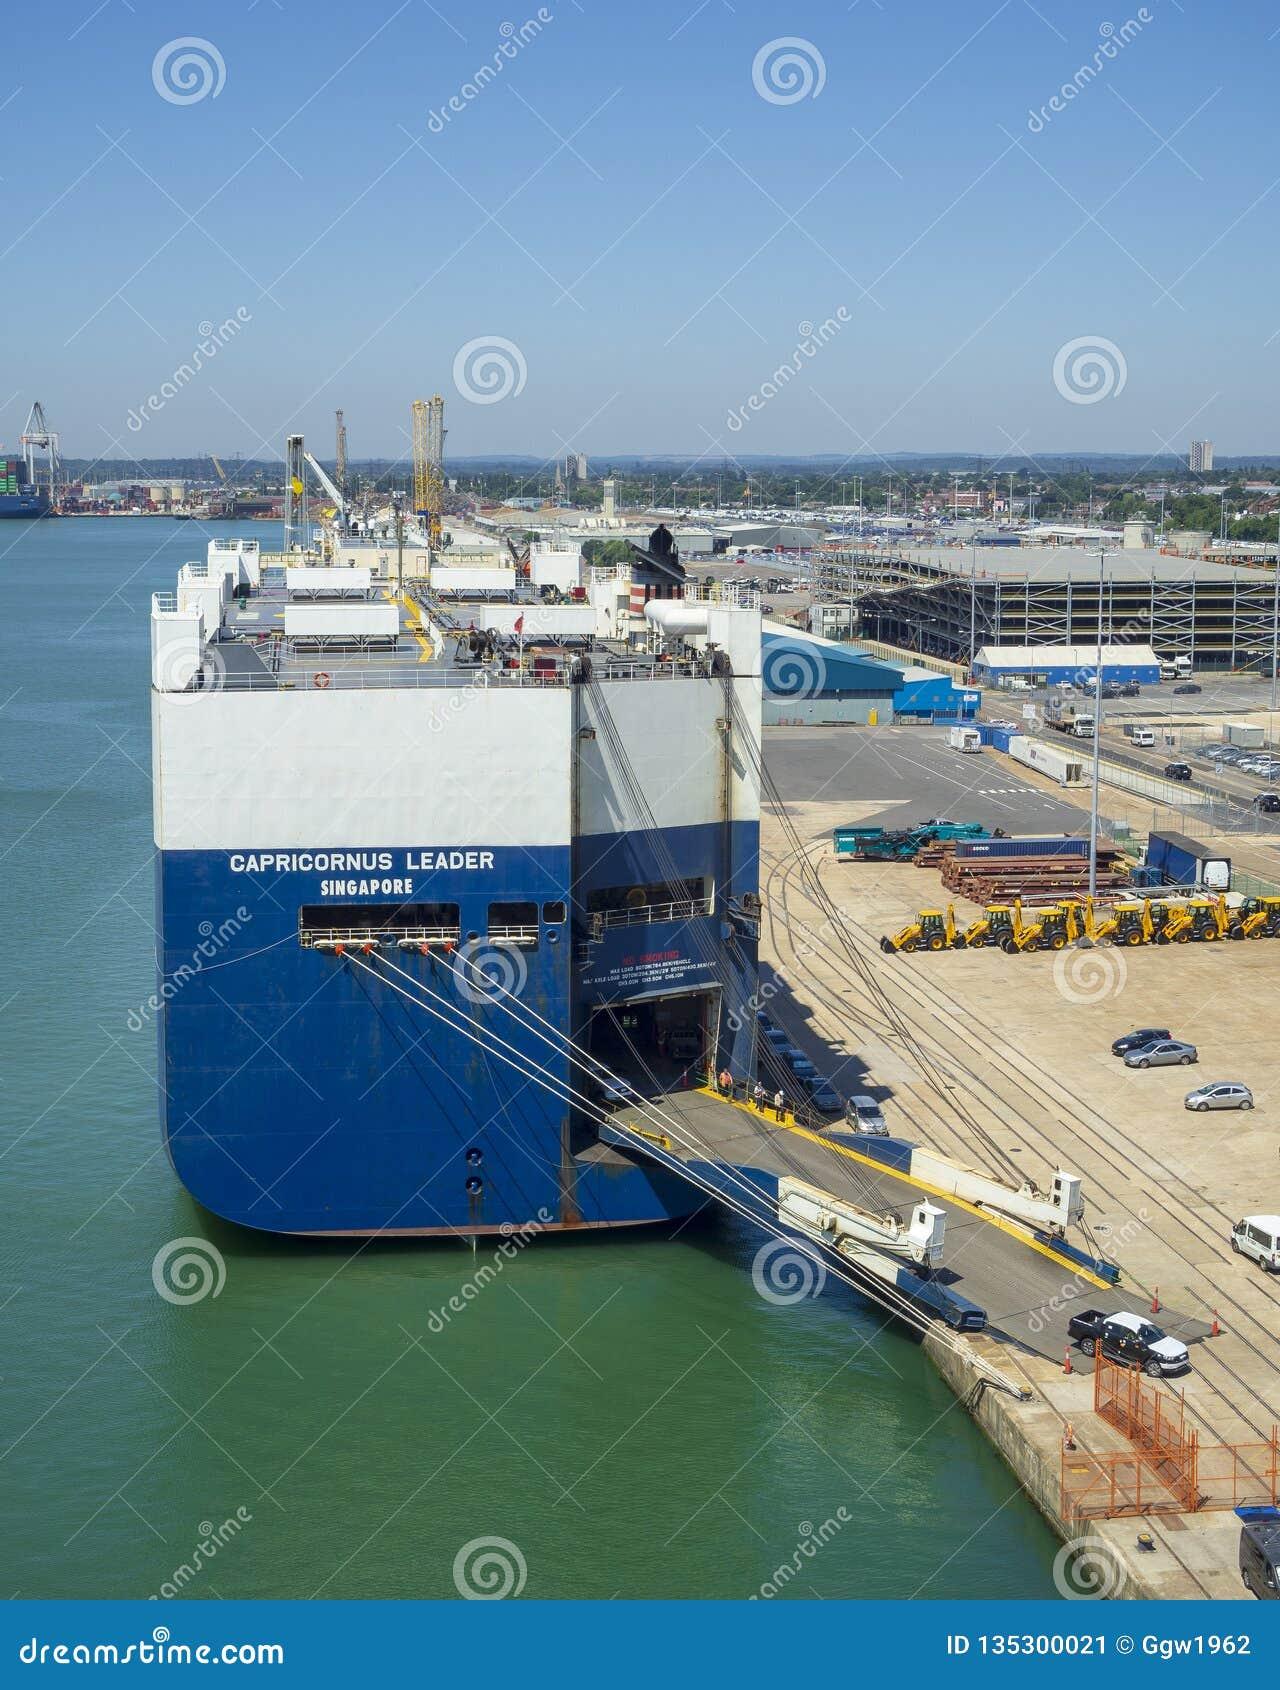 Car Transporter Ship Capricornus Leader Editorial Photo